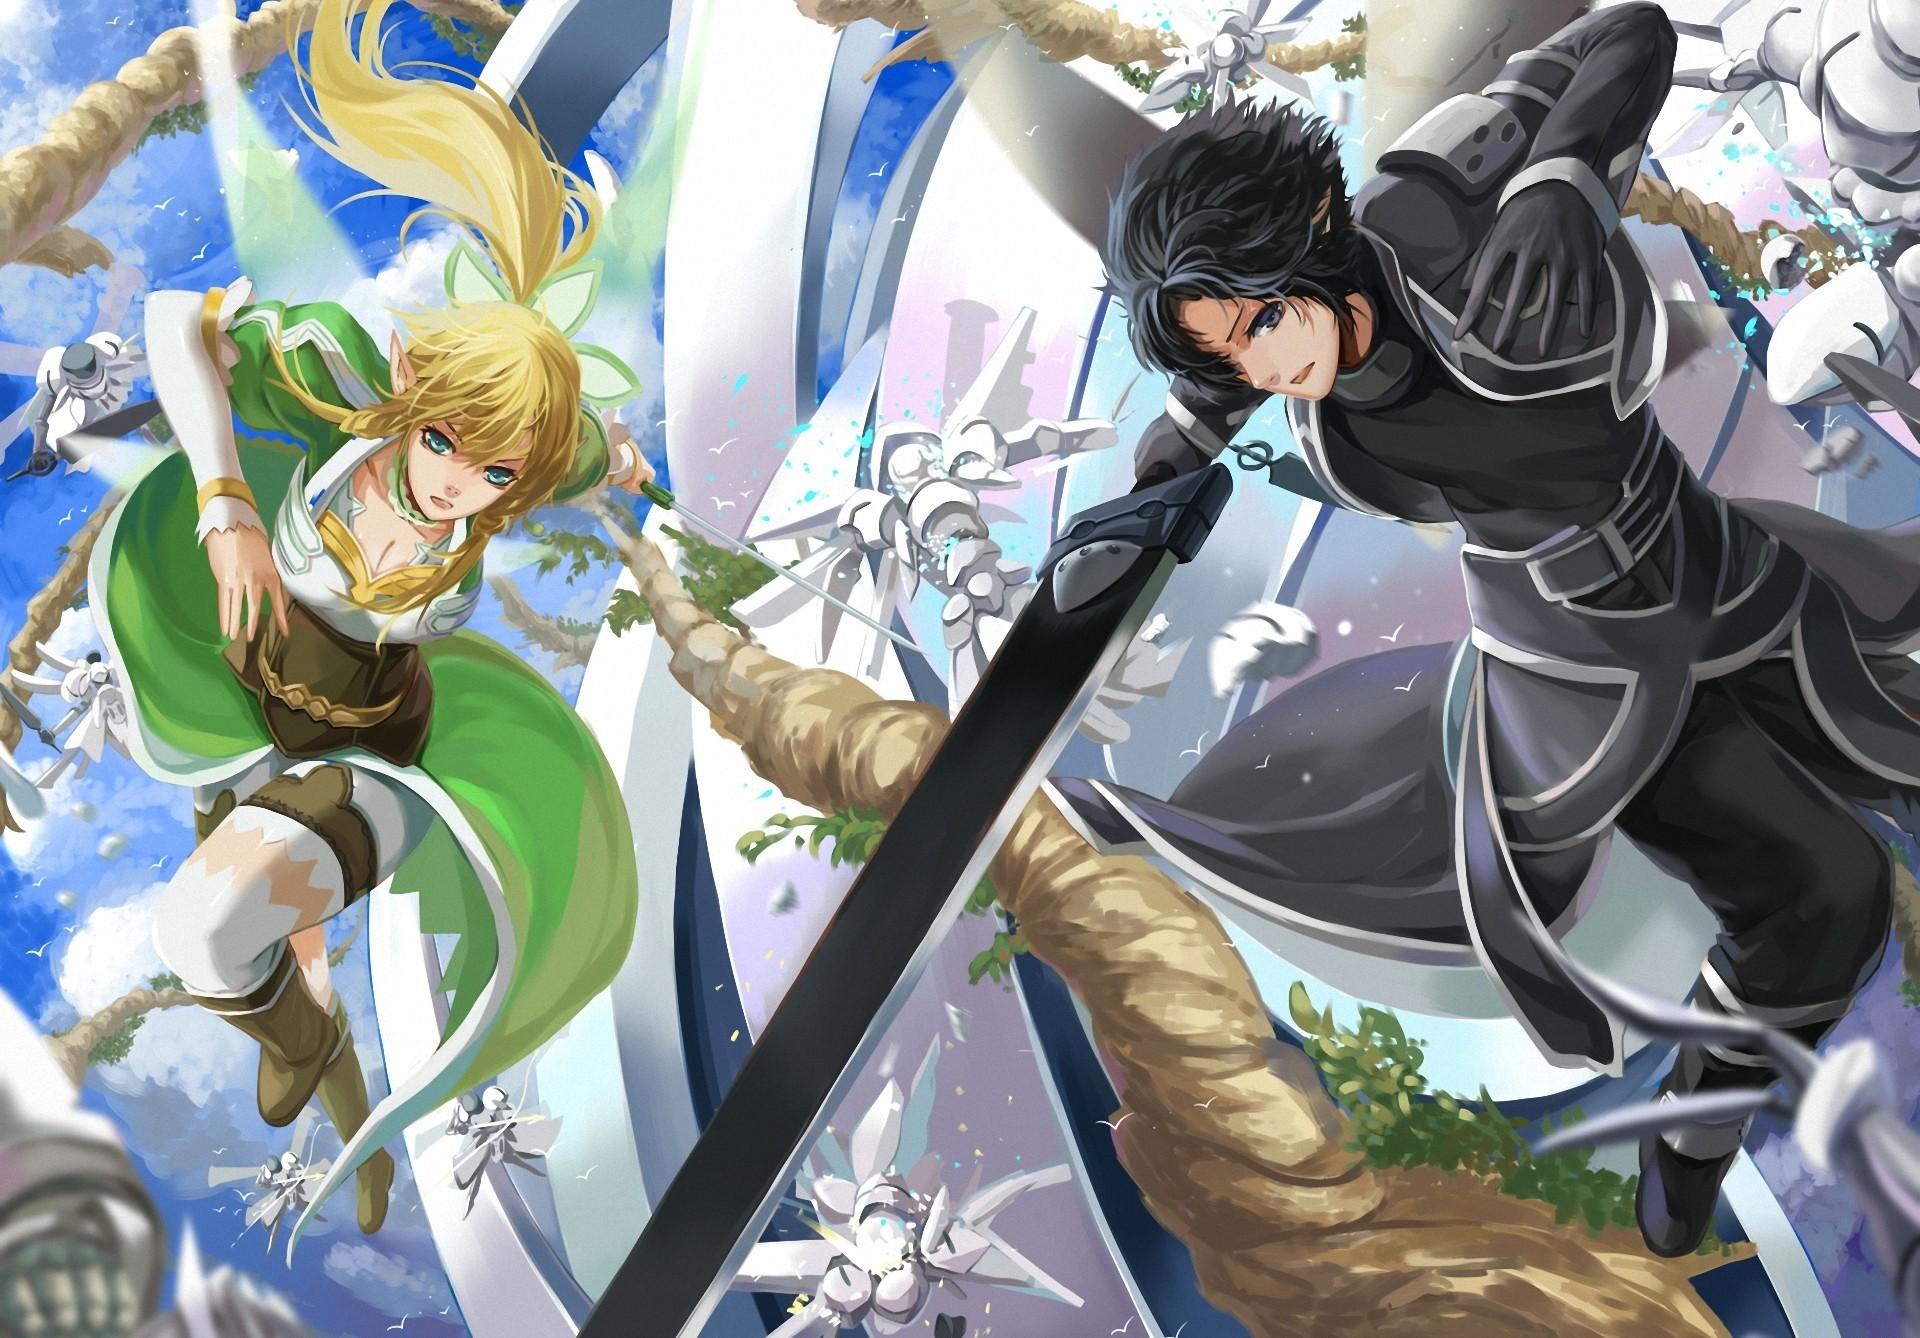 Black Lagoon Iphone X Wallpaper Sword Art Online Full Hd Wallpaper And Achtergrond